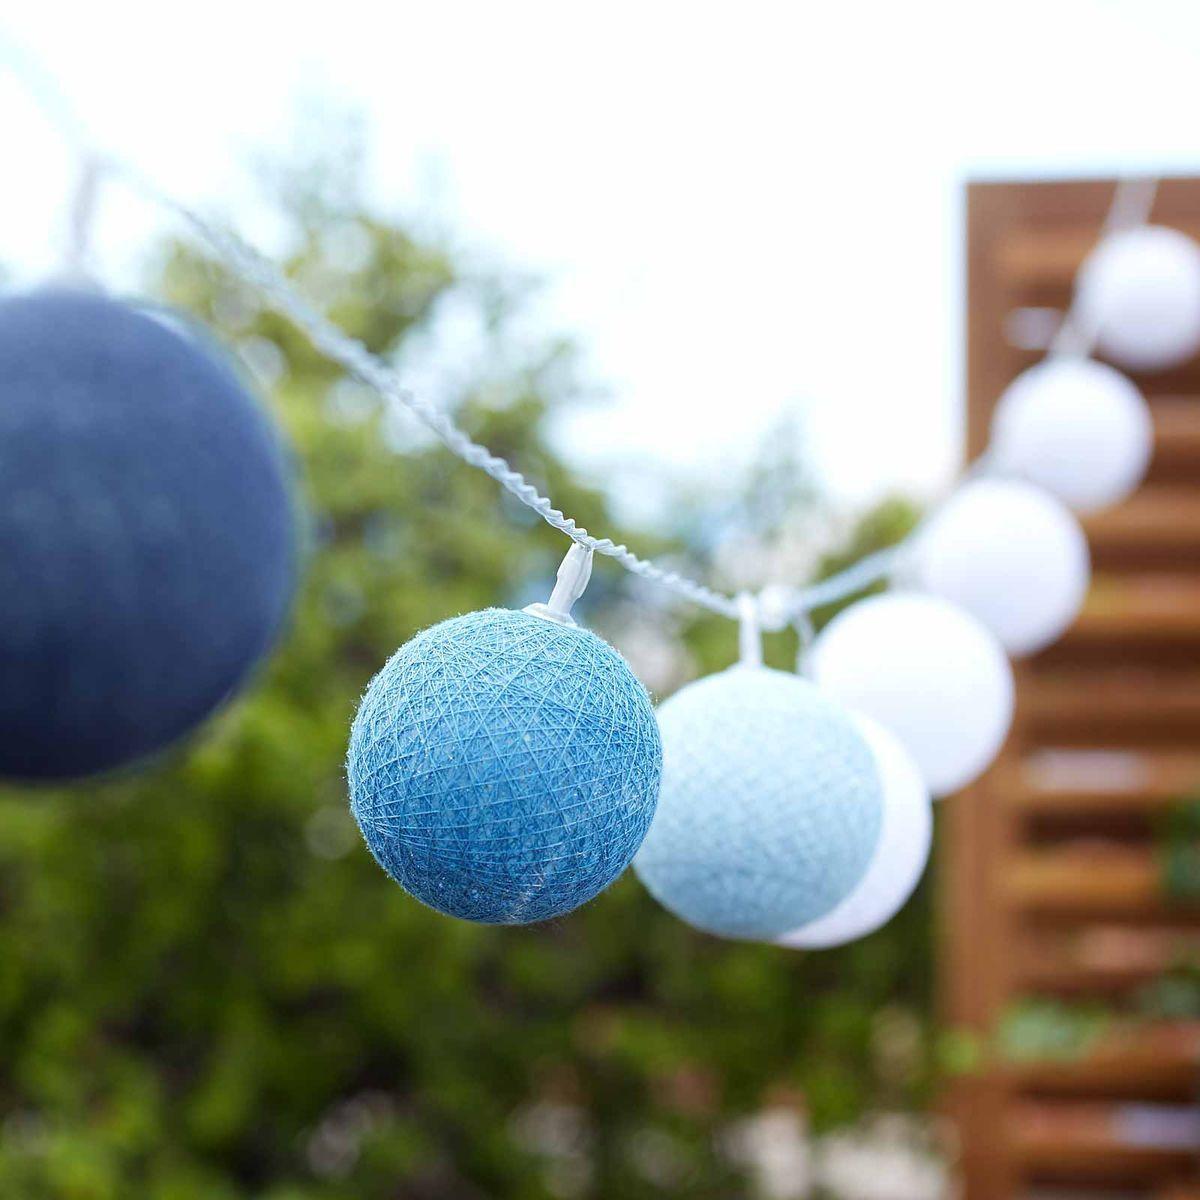 lichterkette solar outdoor 10 leds blau ca l 180 cm f r. Black Bedroom Furniture Sets. Home Design Ideas